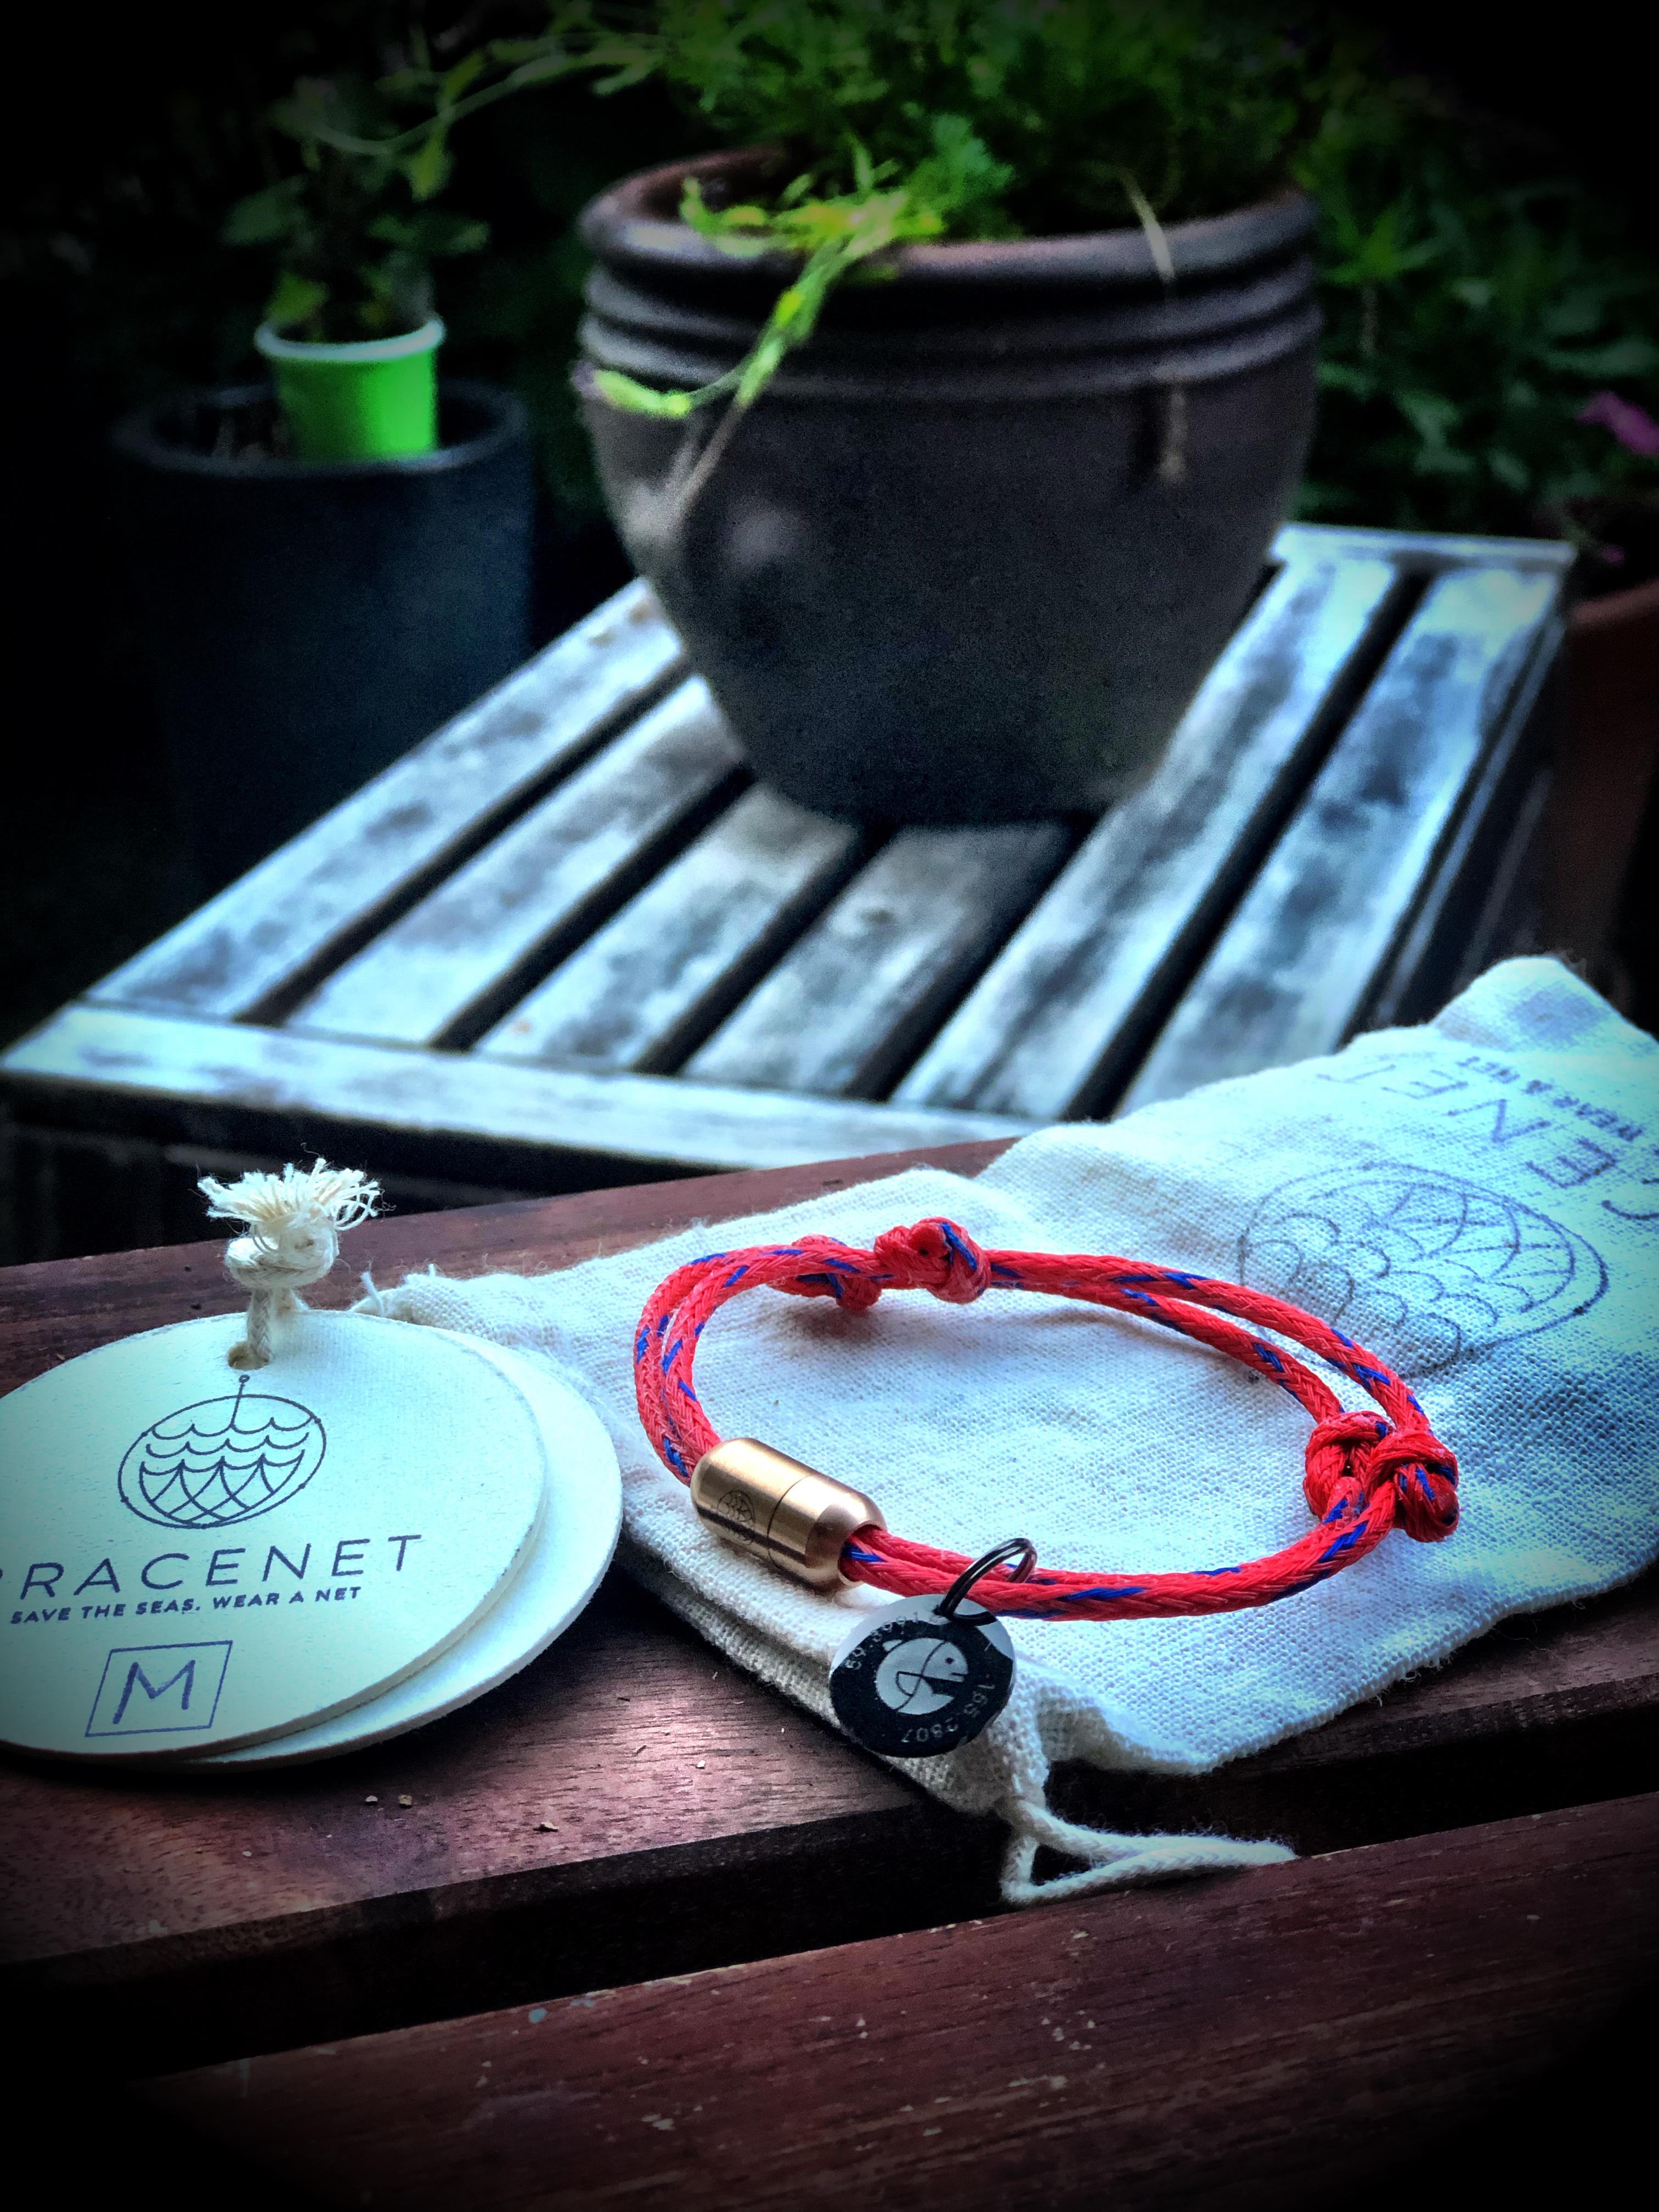 Eva x Bracenet - Recycled Ghost-Net Bracelet